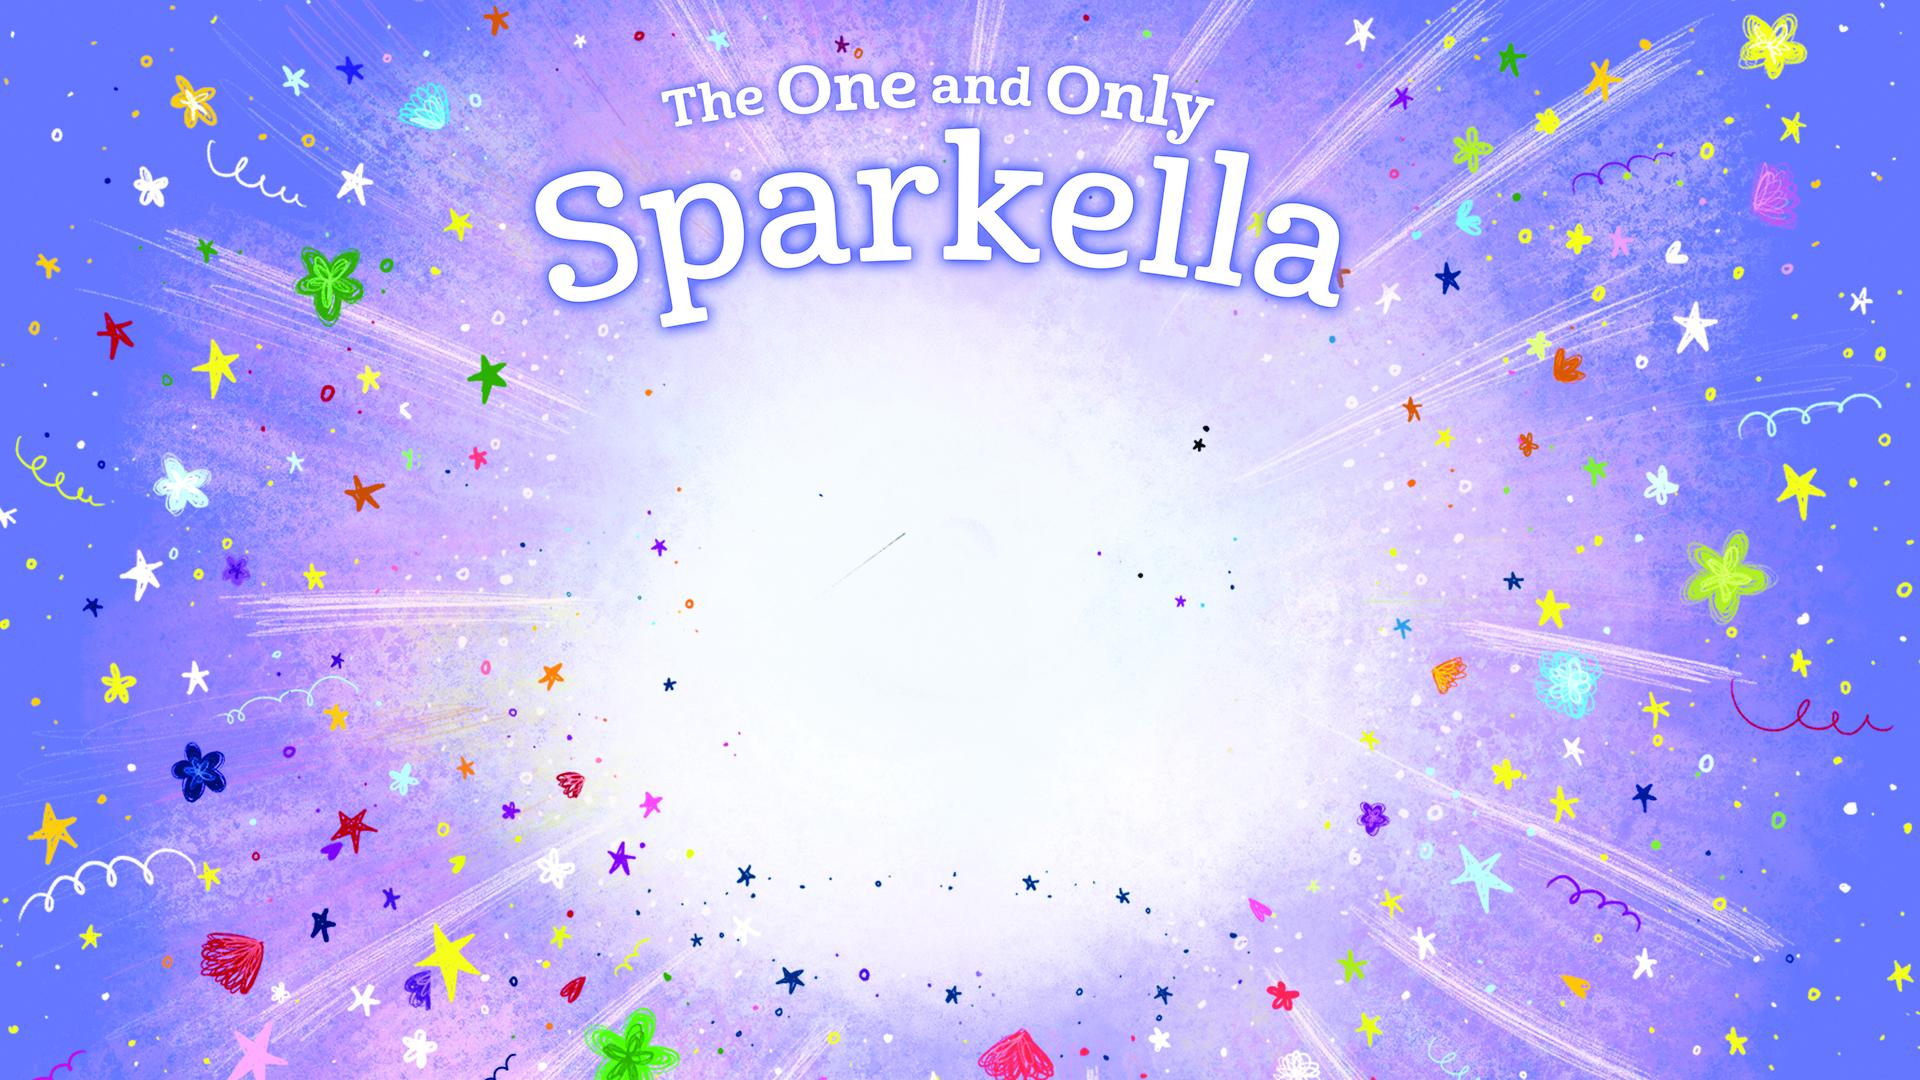 Sparkella-zoom-1